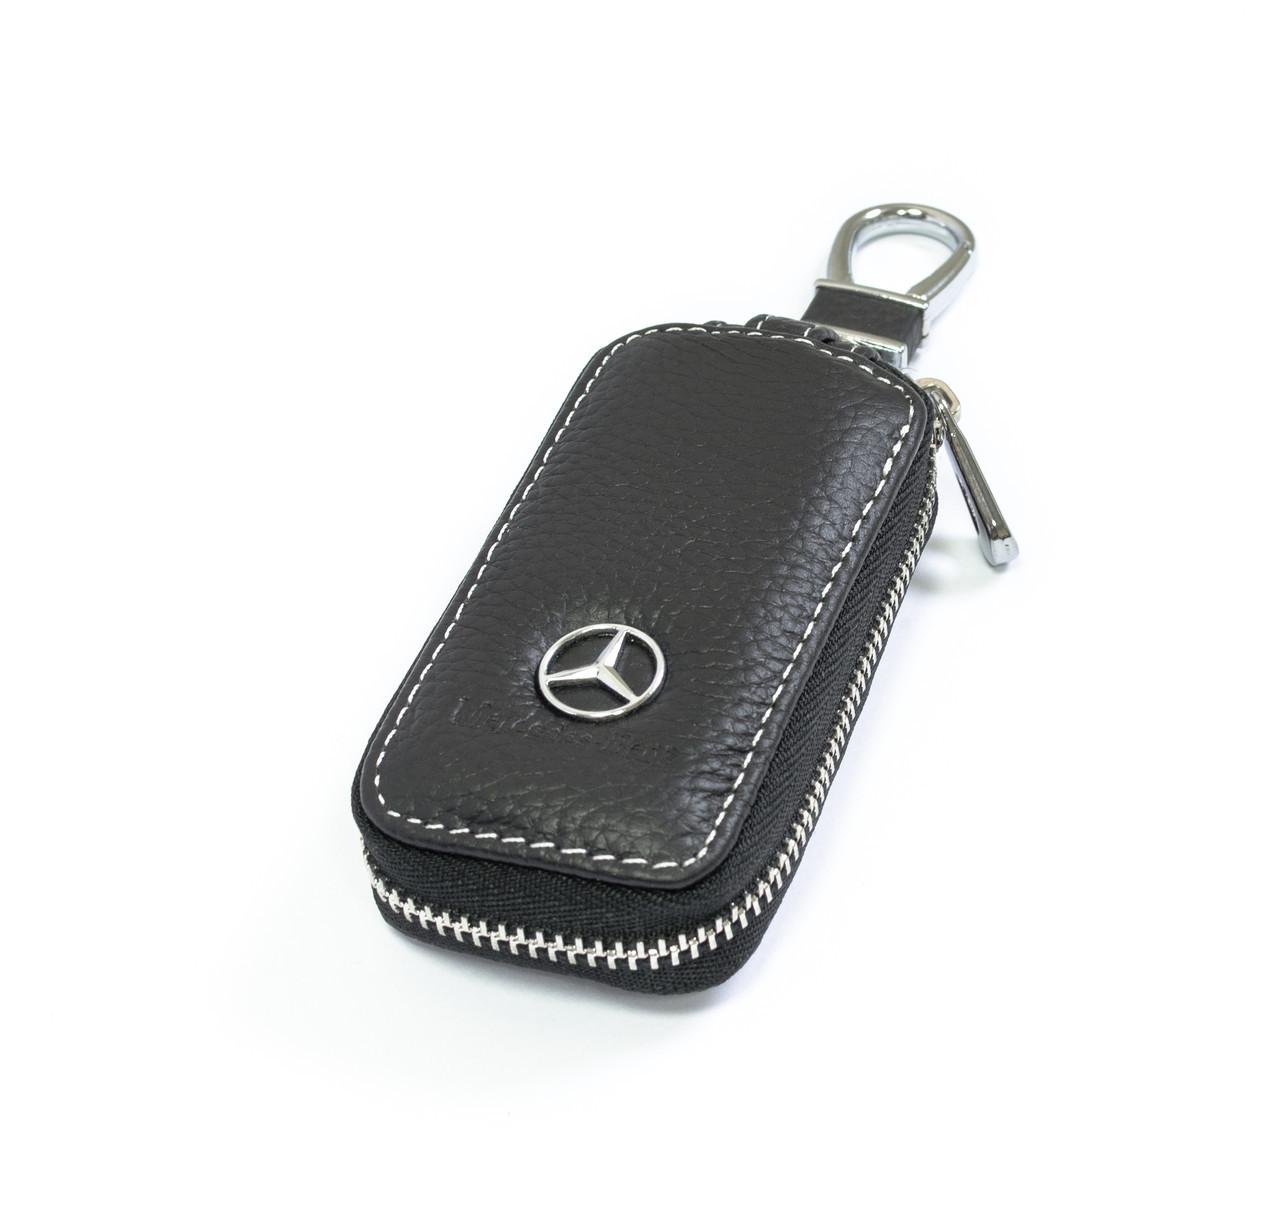 Ключница Carss с логотипом MERCEDES 02010 черная